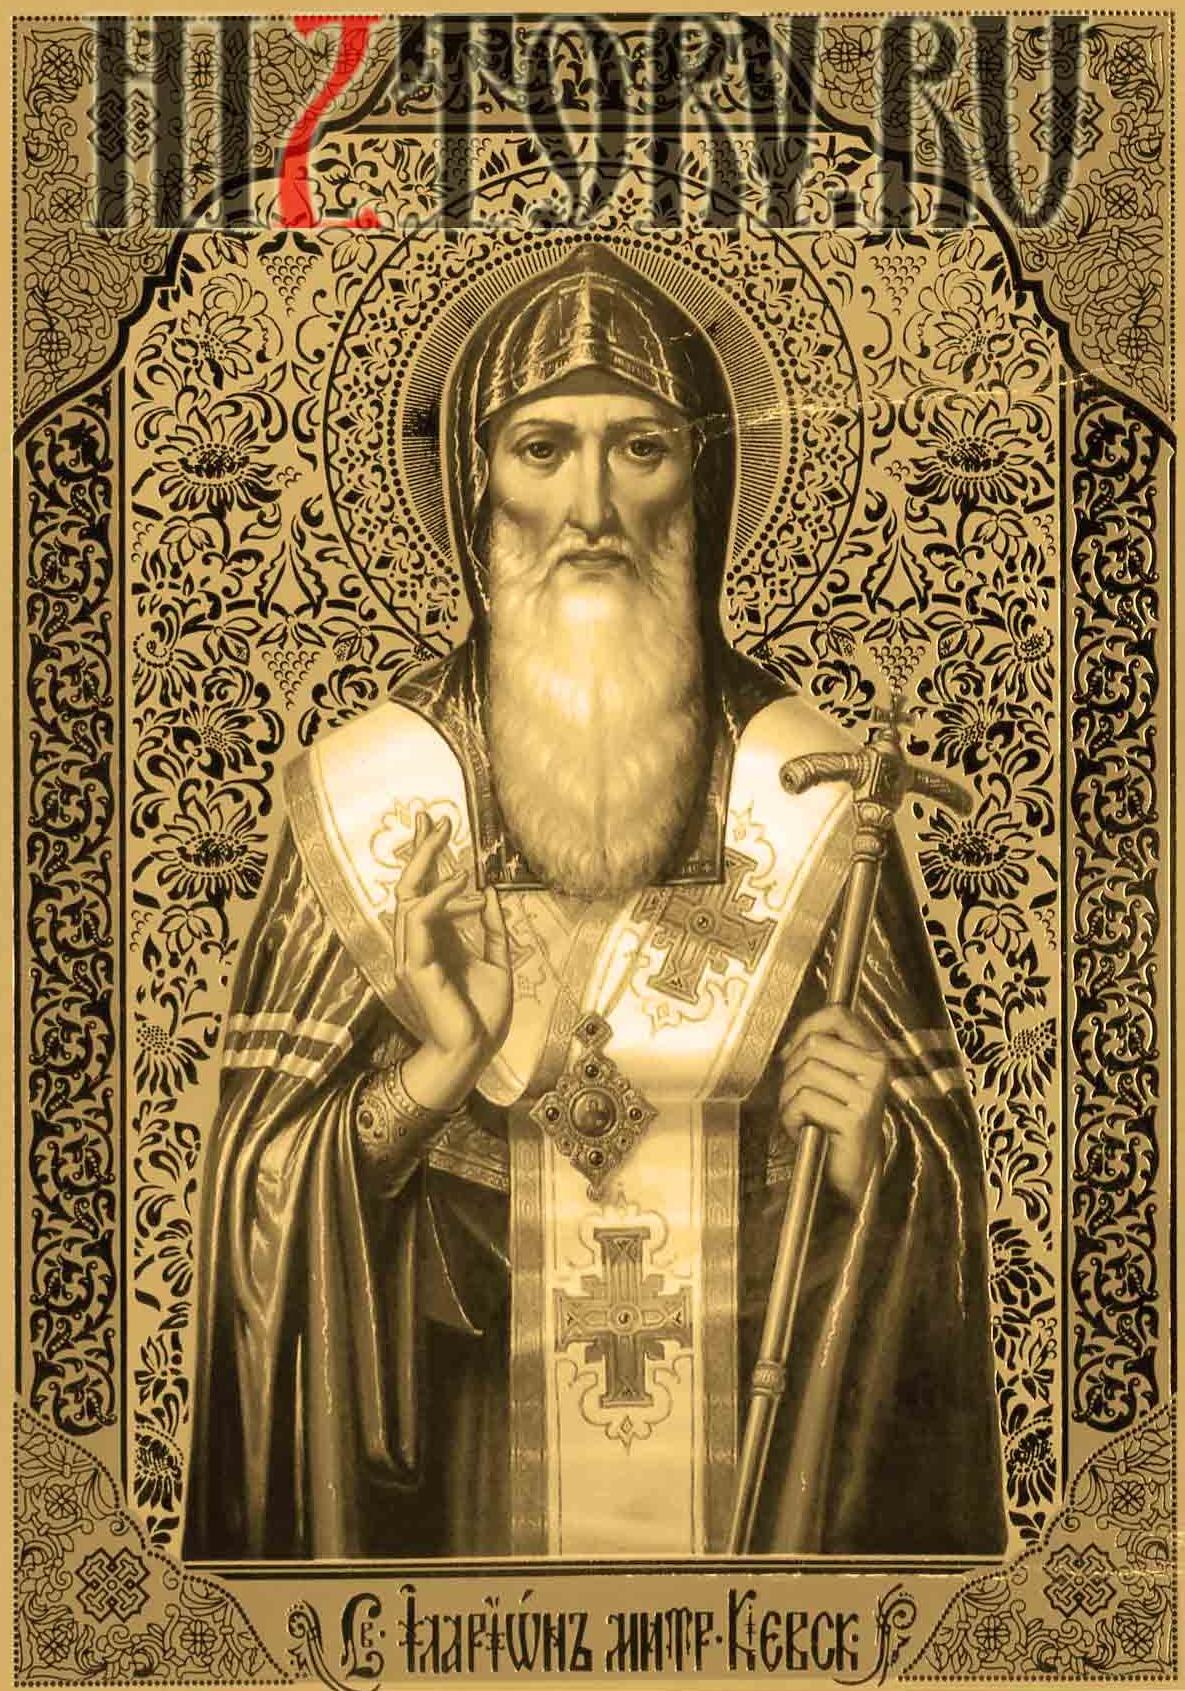 Митрополит Илларион, церковь при Ярославе Мудром